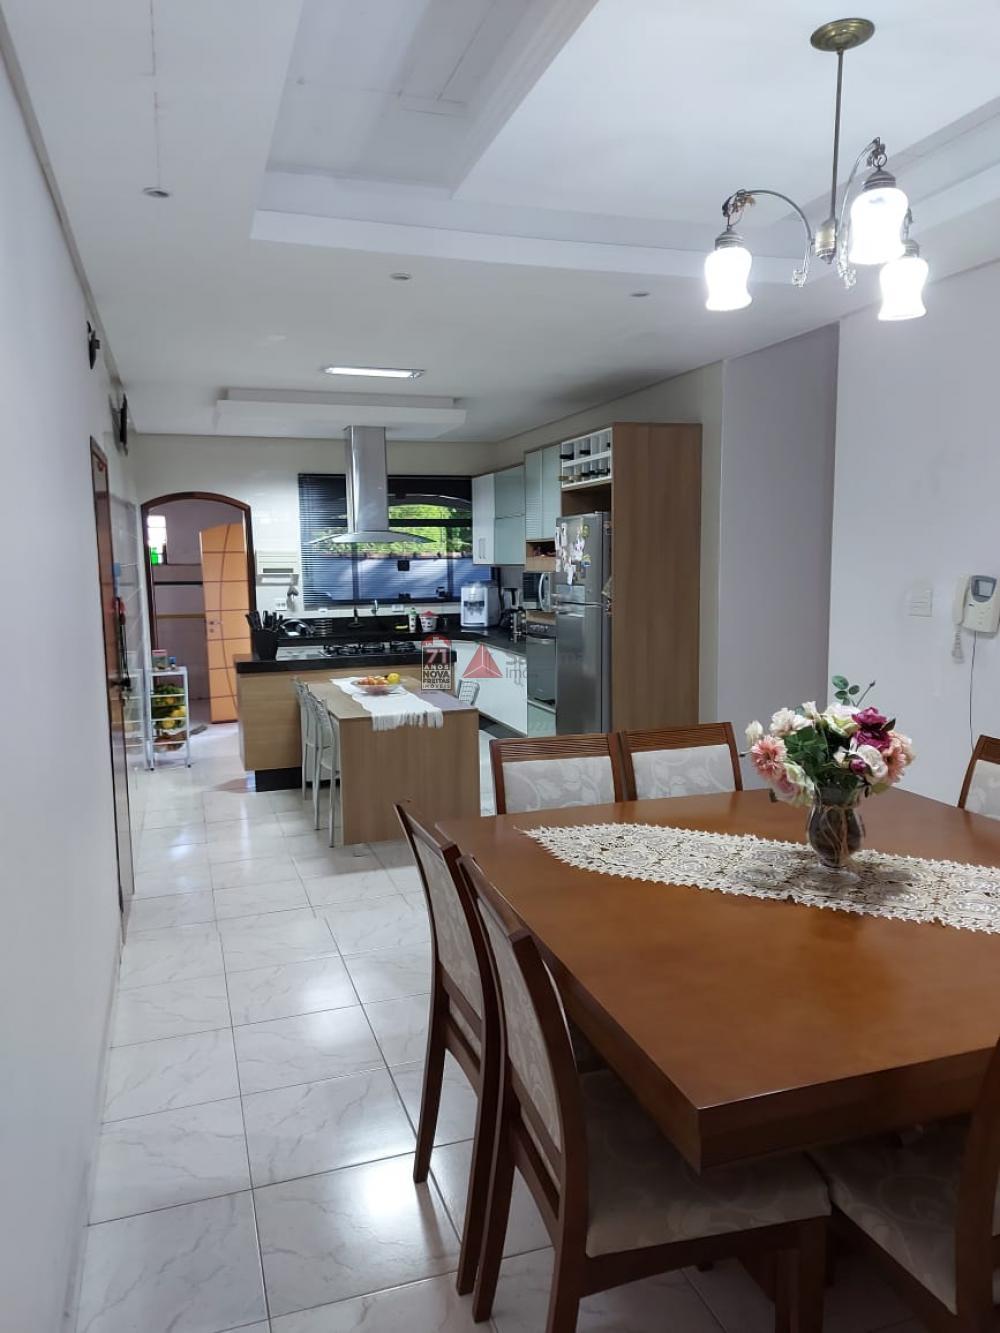 Comprar Casa / Padrão em Pindamonhangaba R$ 900.000,00 - Foto 4